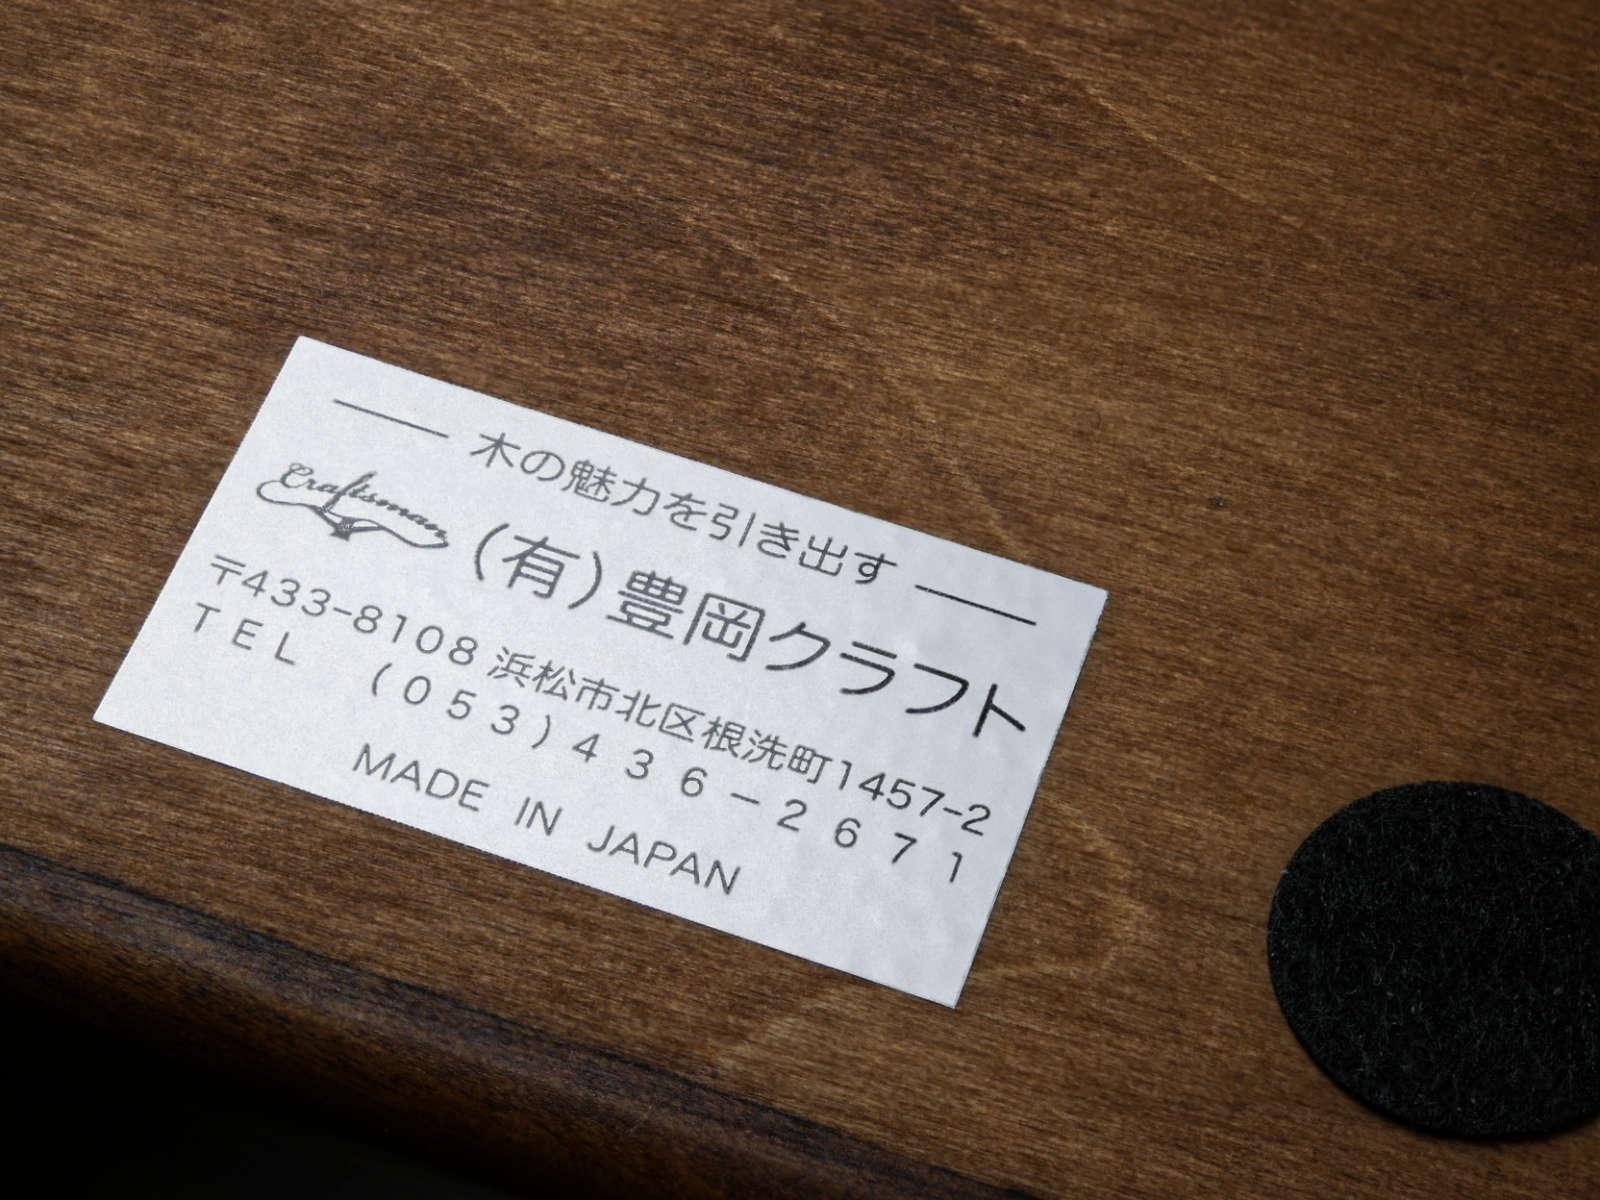 Toyooka Craft Watch Box back